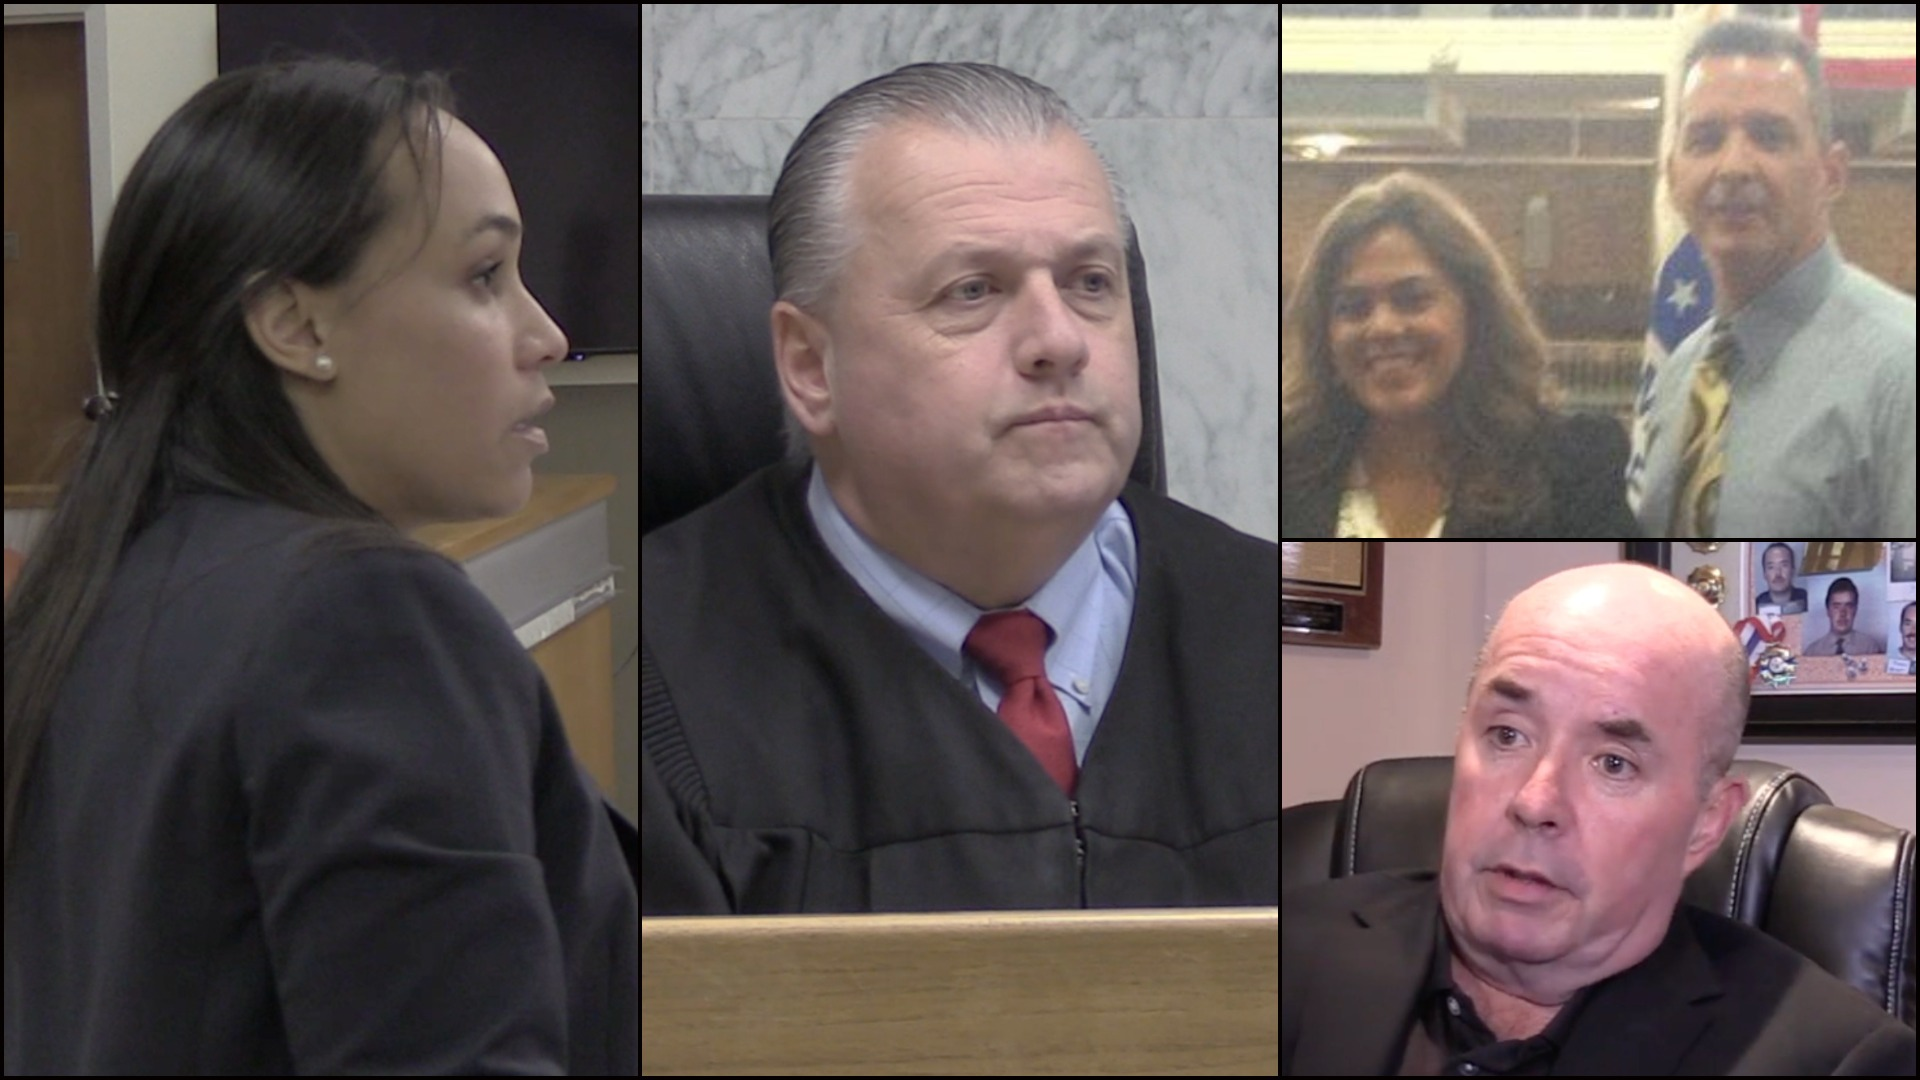 Christina Krauthamer - Judge John A. Young - Esther Suarez - Brian Duval - Cowan Investigations